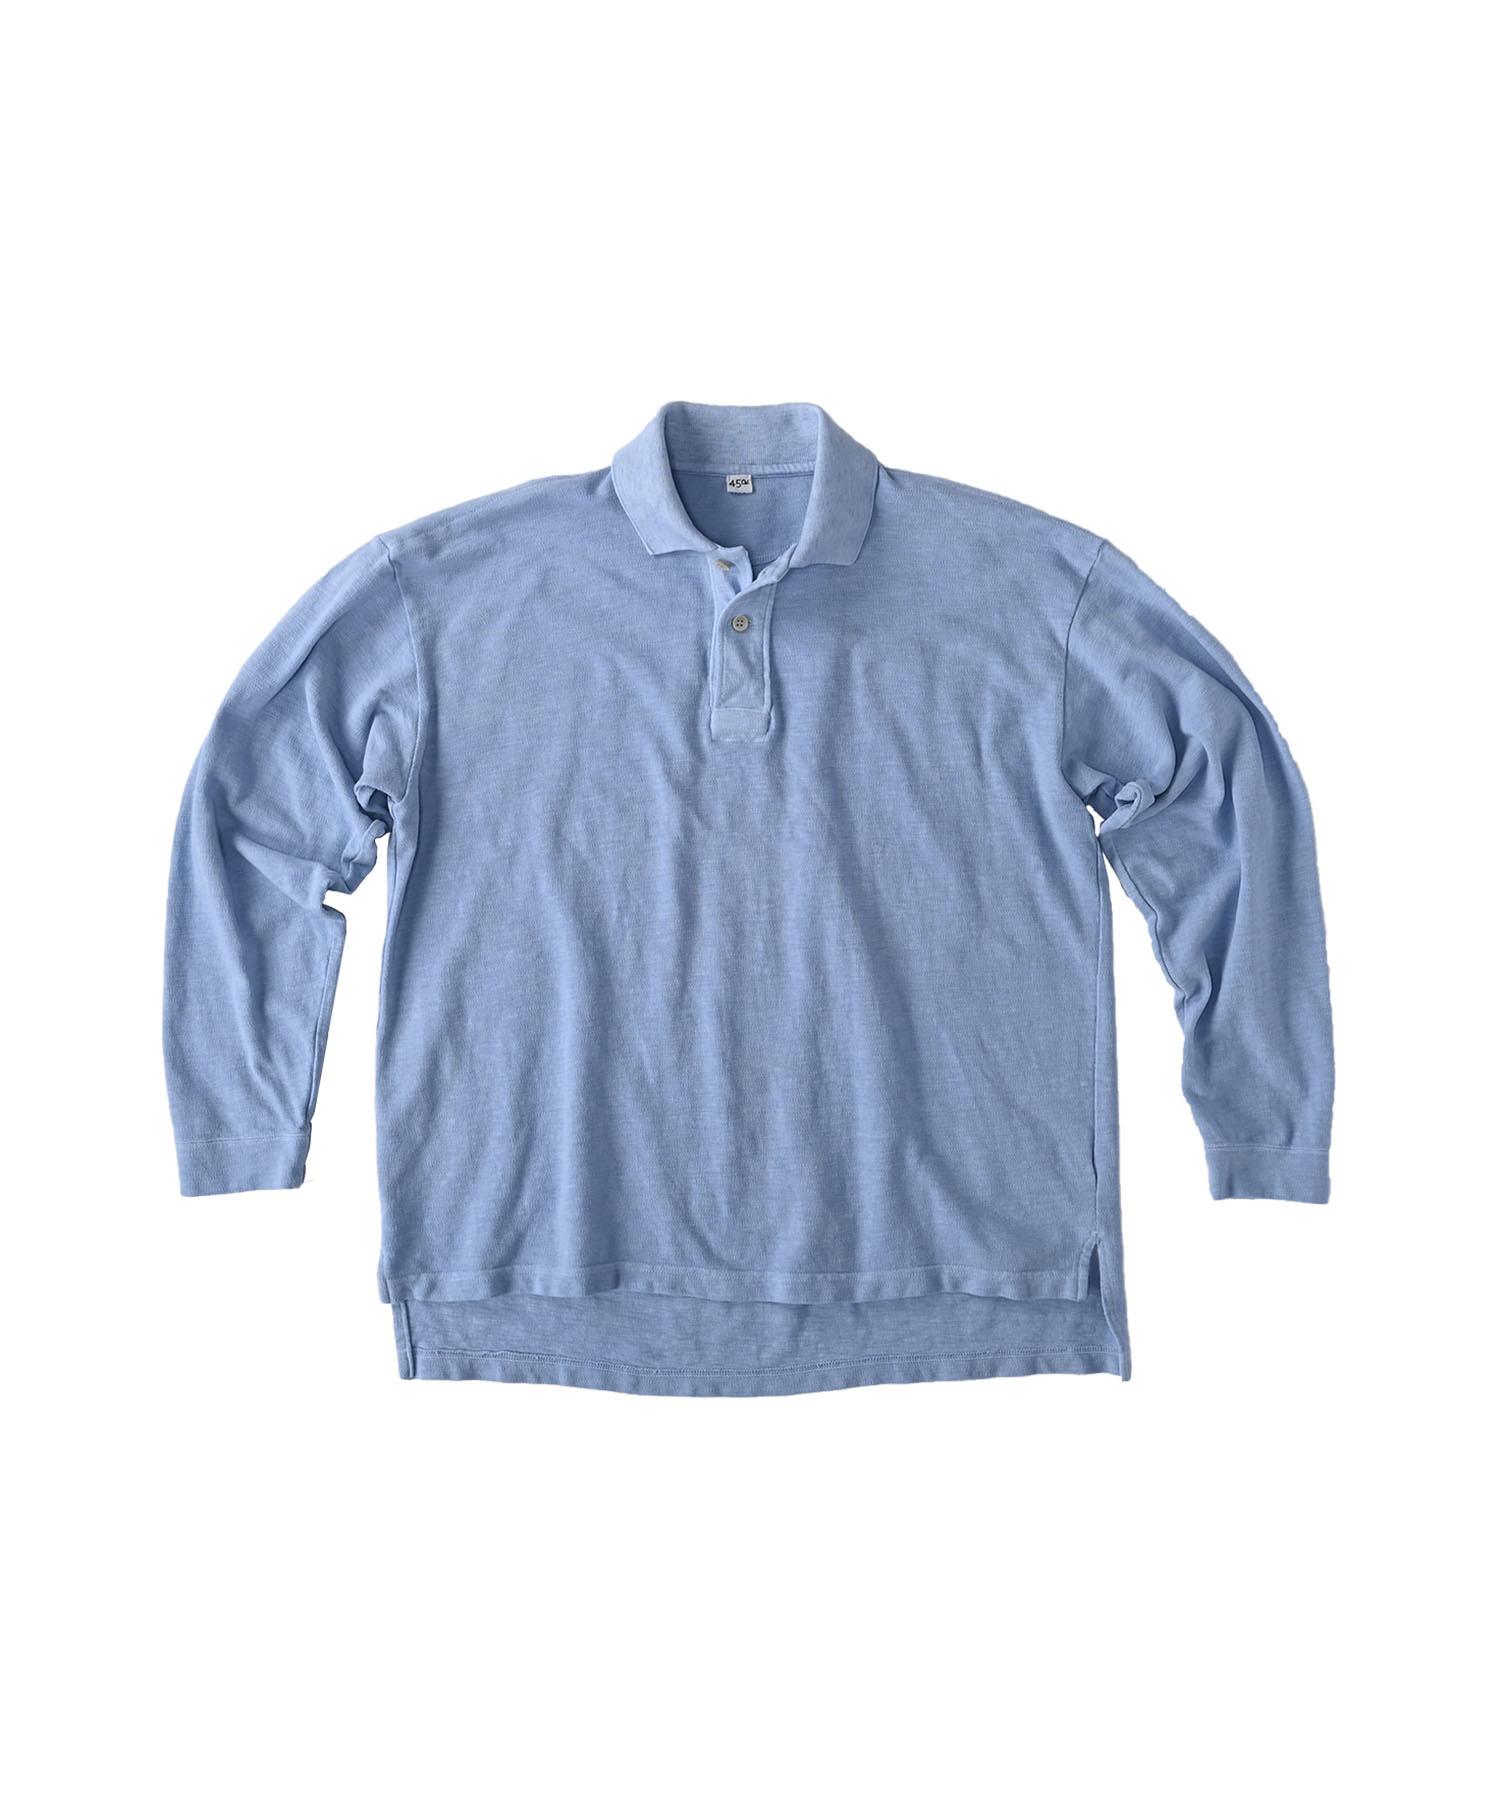 Kanoko Ocean Shiokaze Long-sleeved Polo Shirt (0421)-8